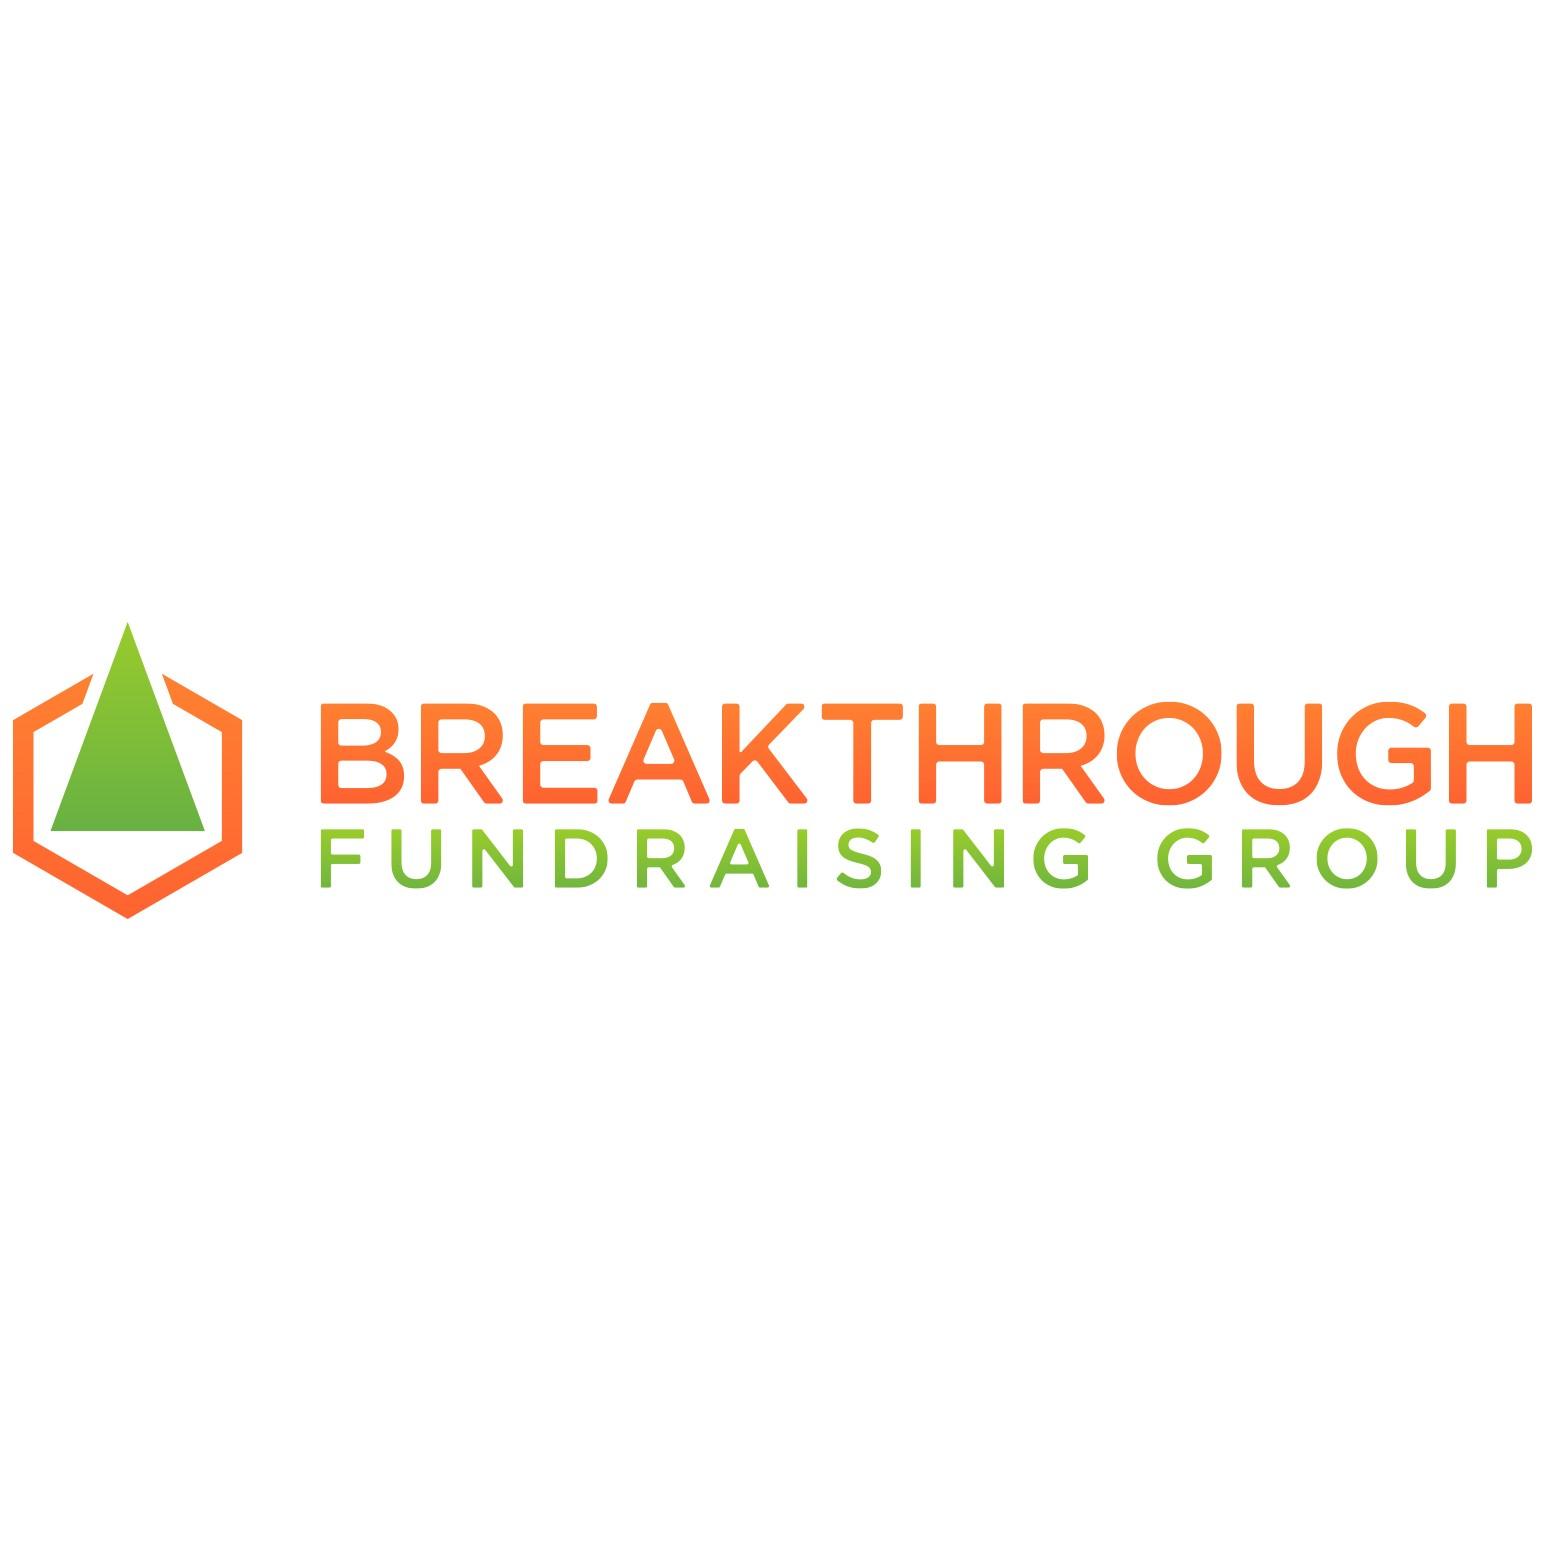 Breakthrough Fundraising Group